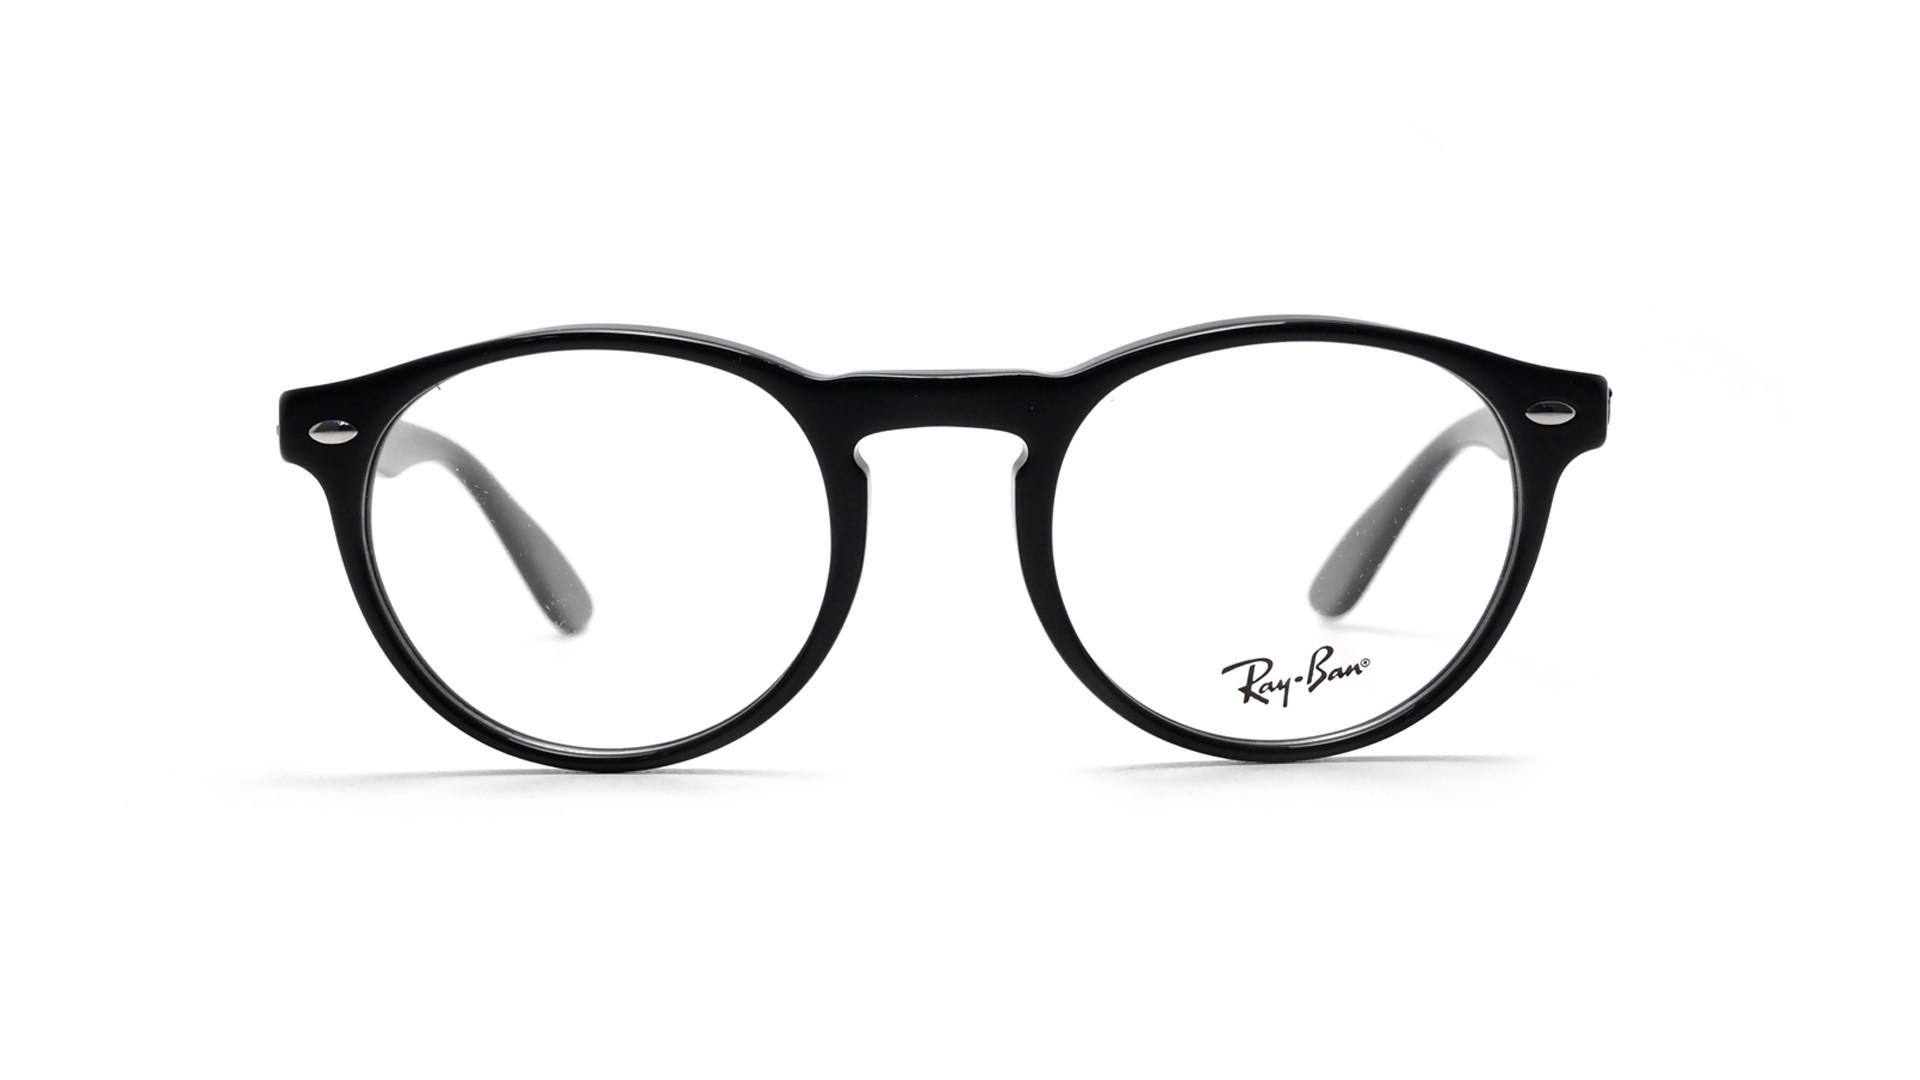 9f948eebb2 Lunettes de vue Ray-Ban Icons Black RX5283 RB5283 2000 49-21 ...